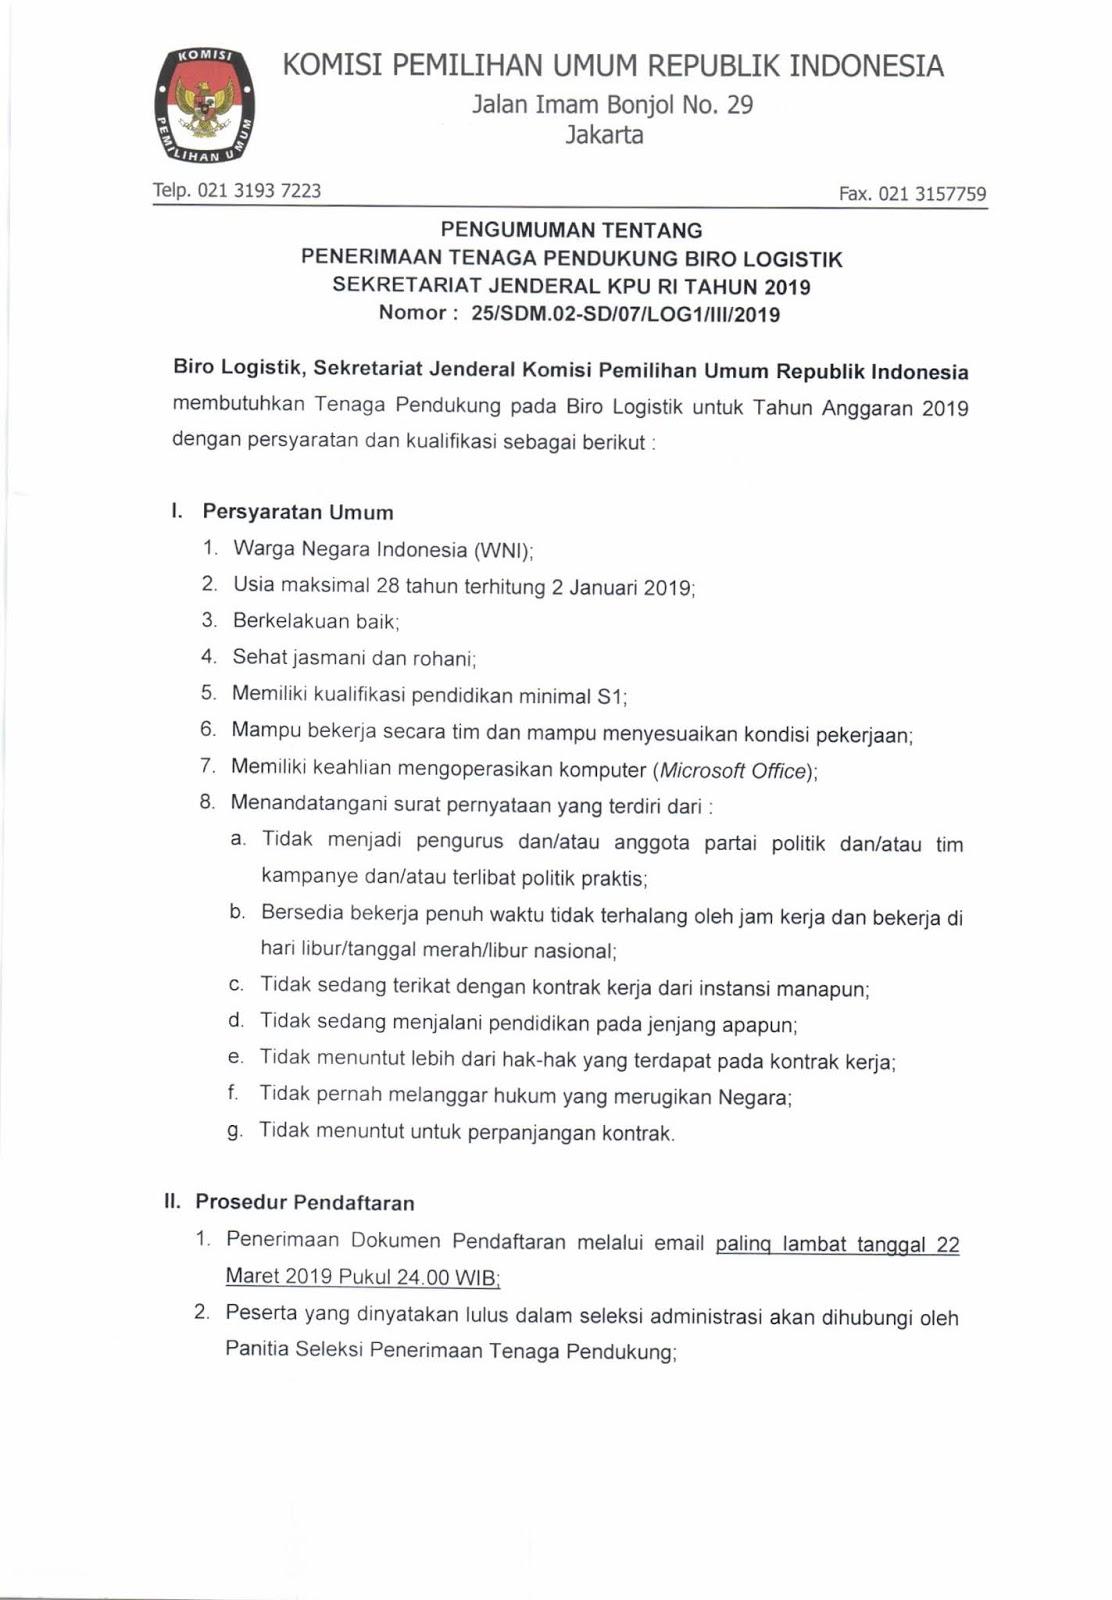 Biro Logistik Komisi Pemilihan Umum Republik Indonesia